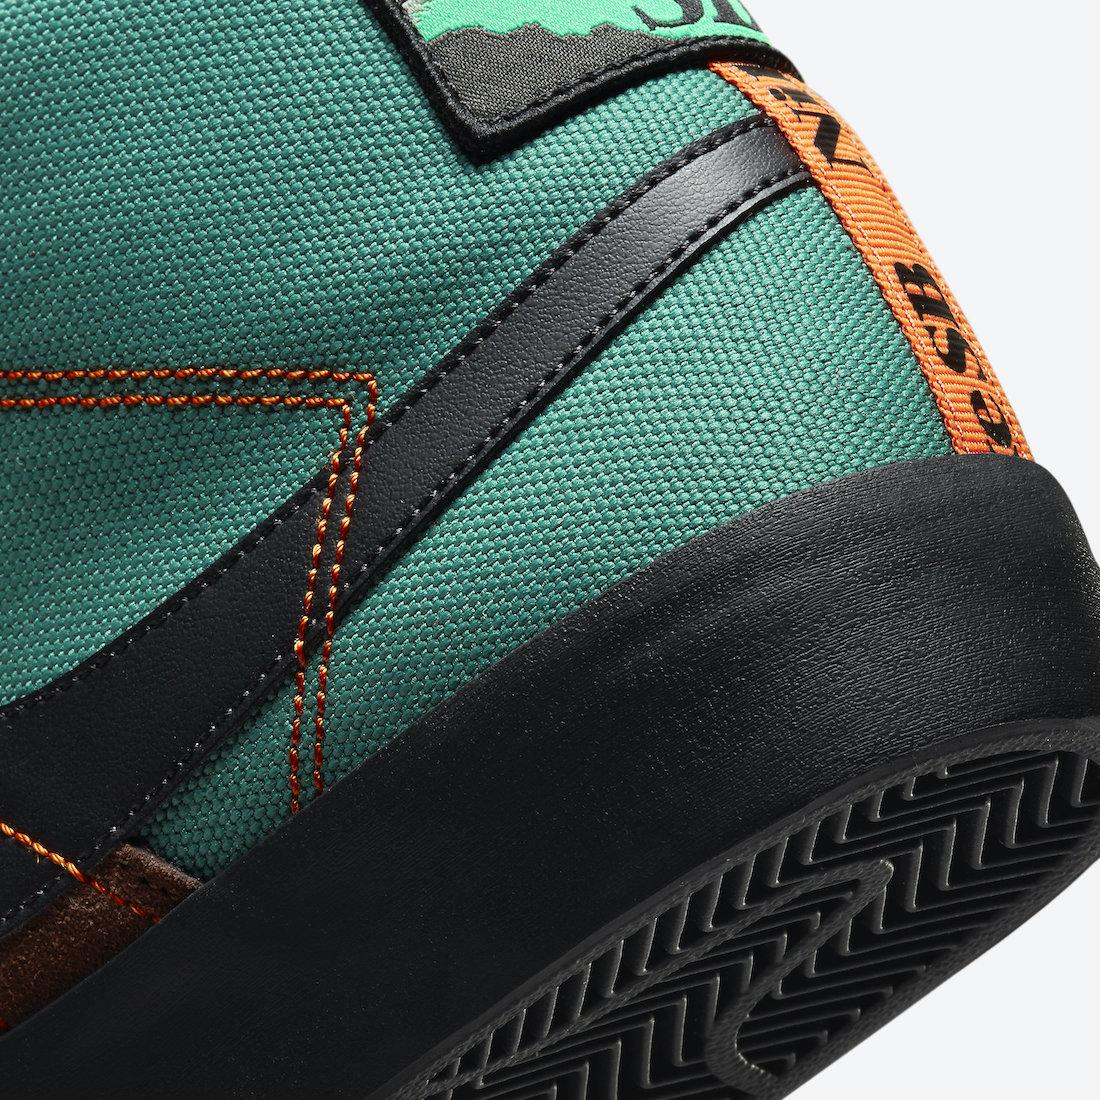 Nike SB Blazer Mid Acclimate Noble Green DC8903-300 Release Date Info